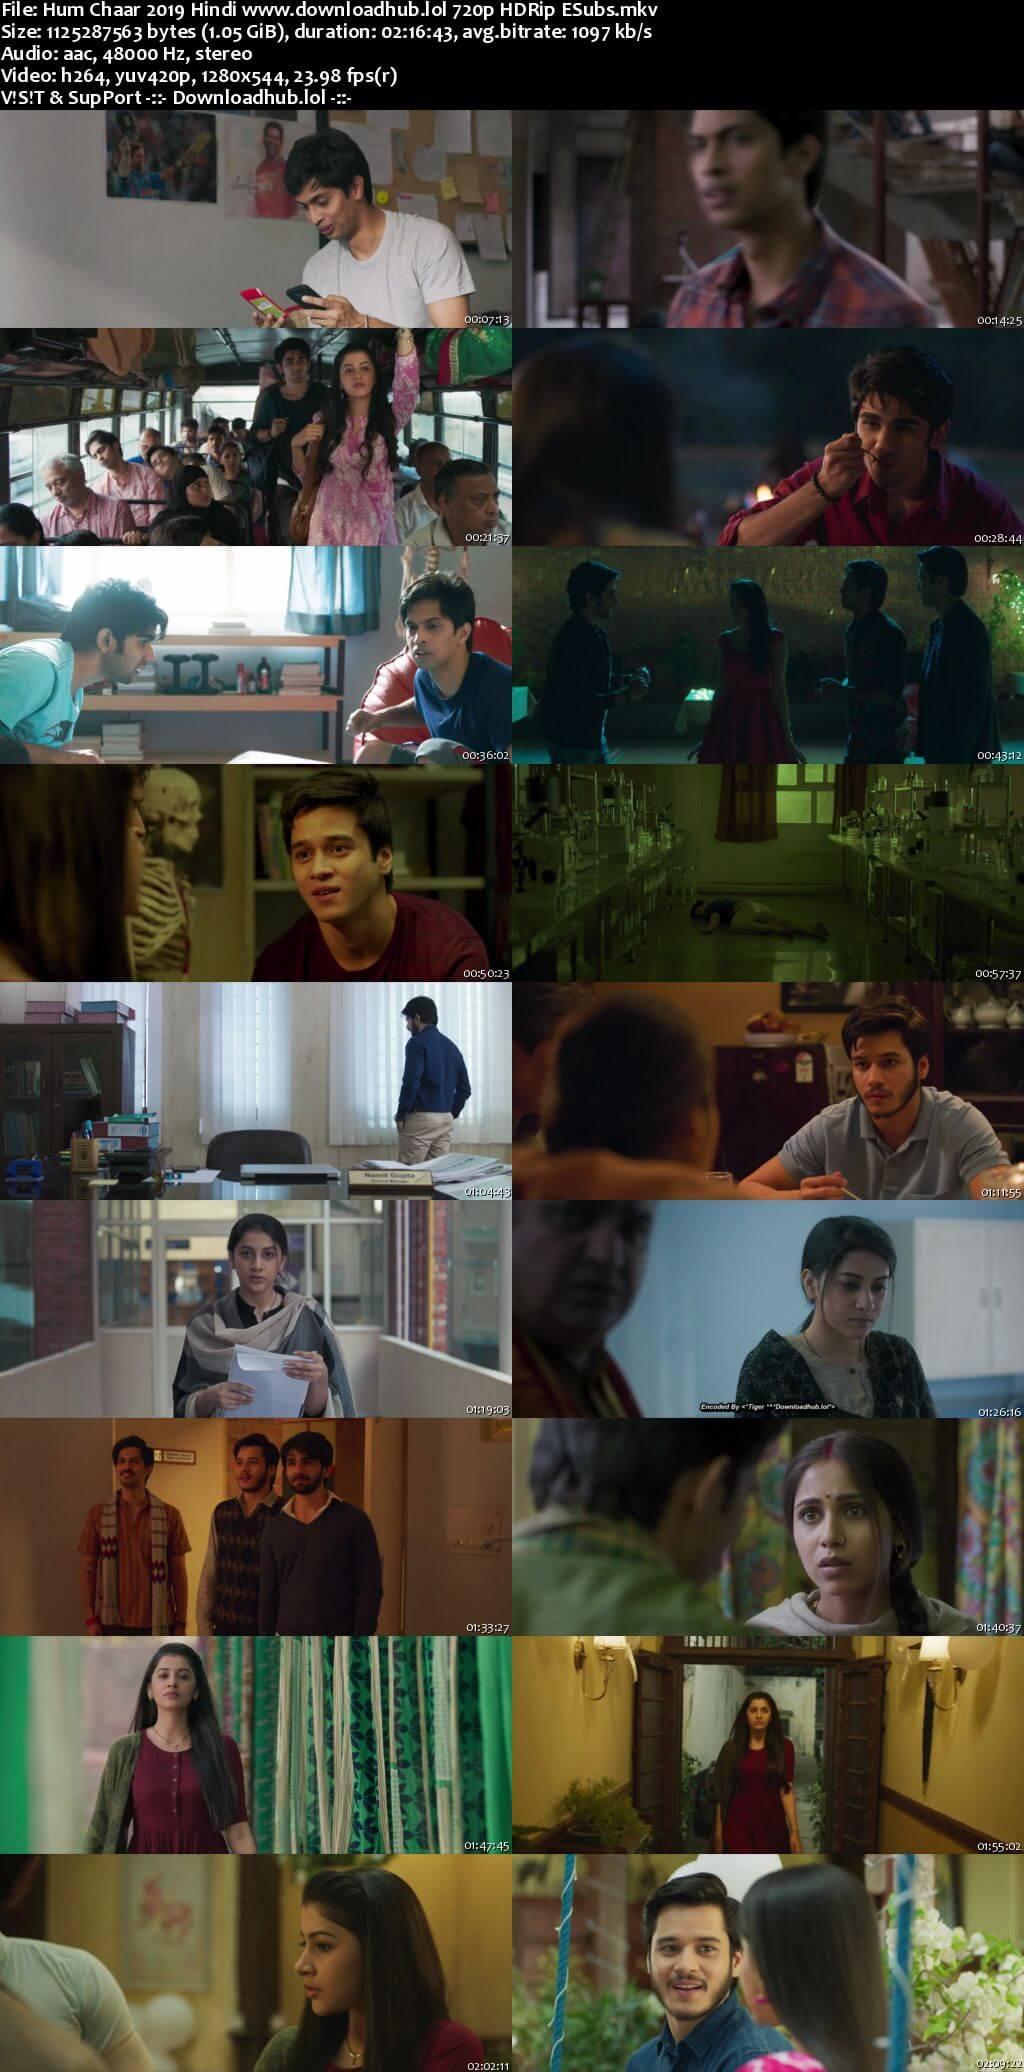 Hum Chaar 2019 Hindi 720p HDRip ESubs